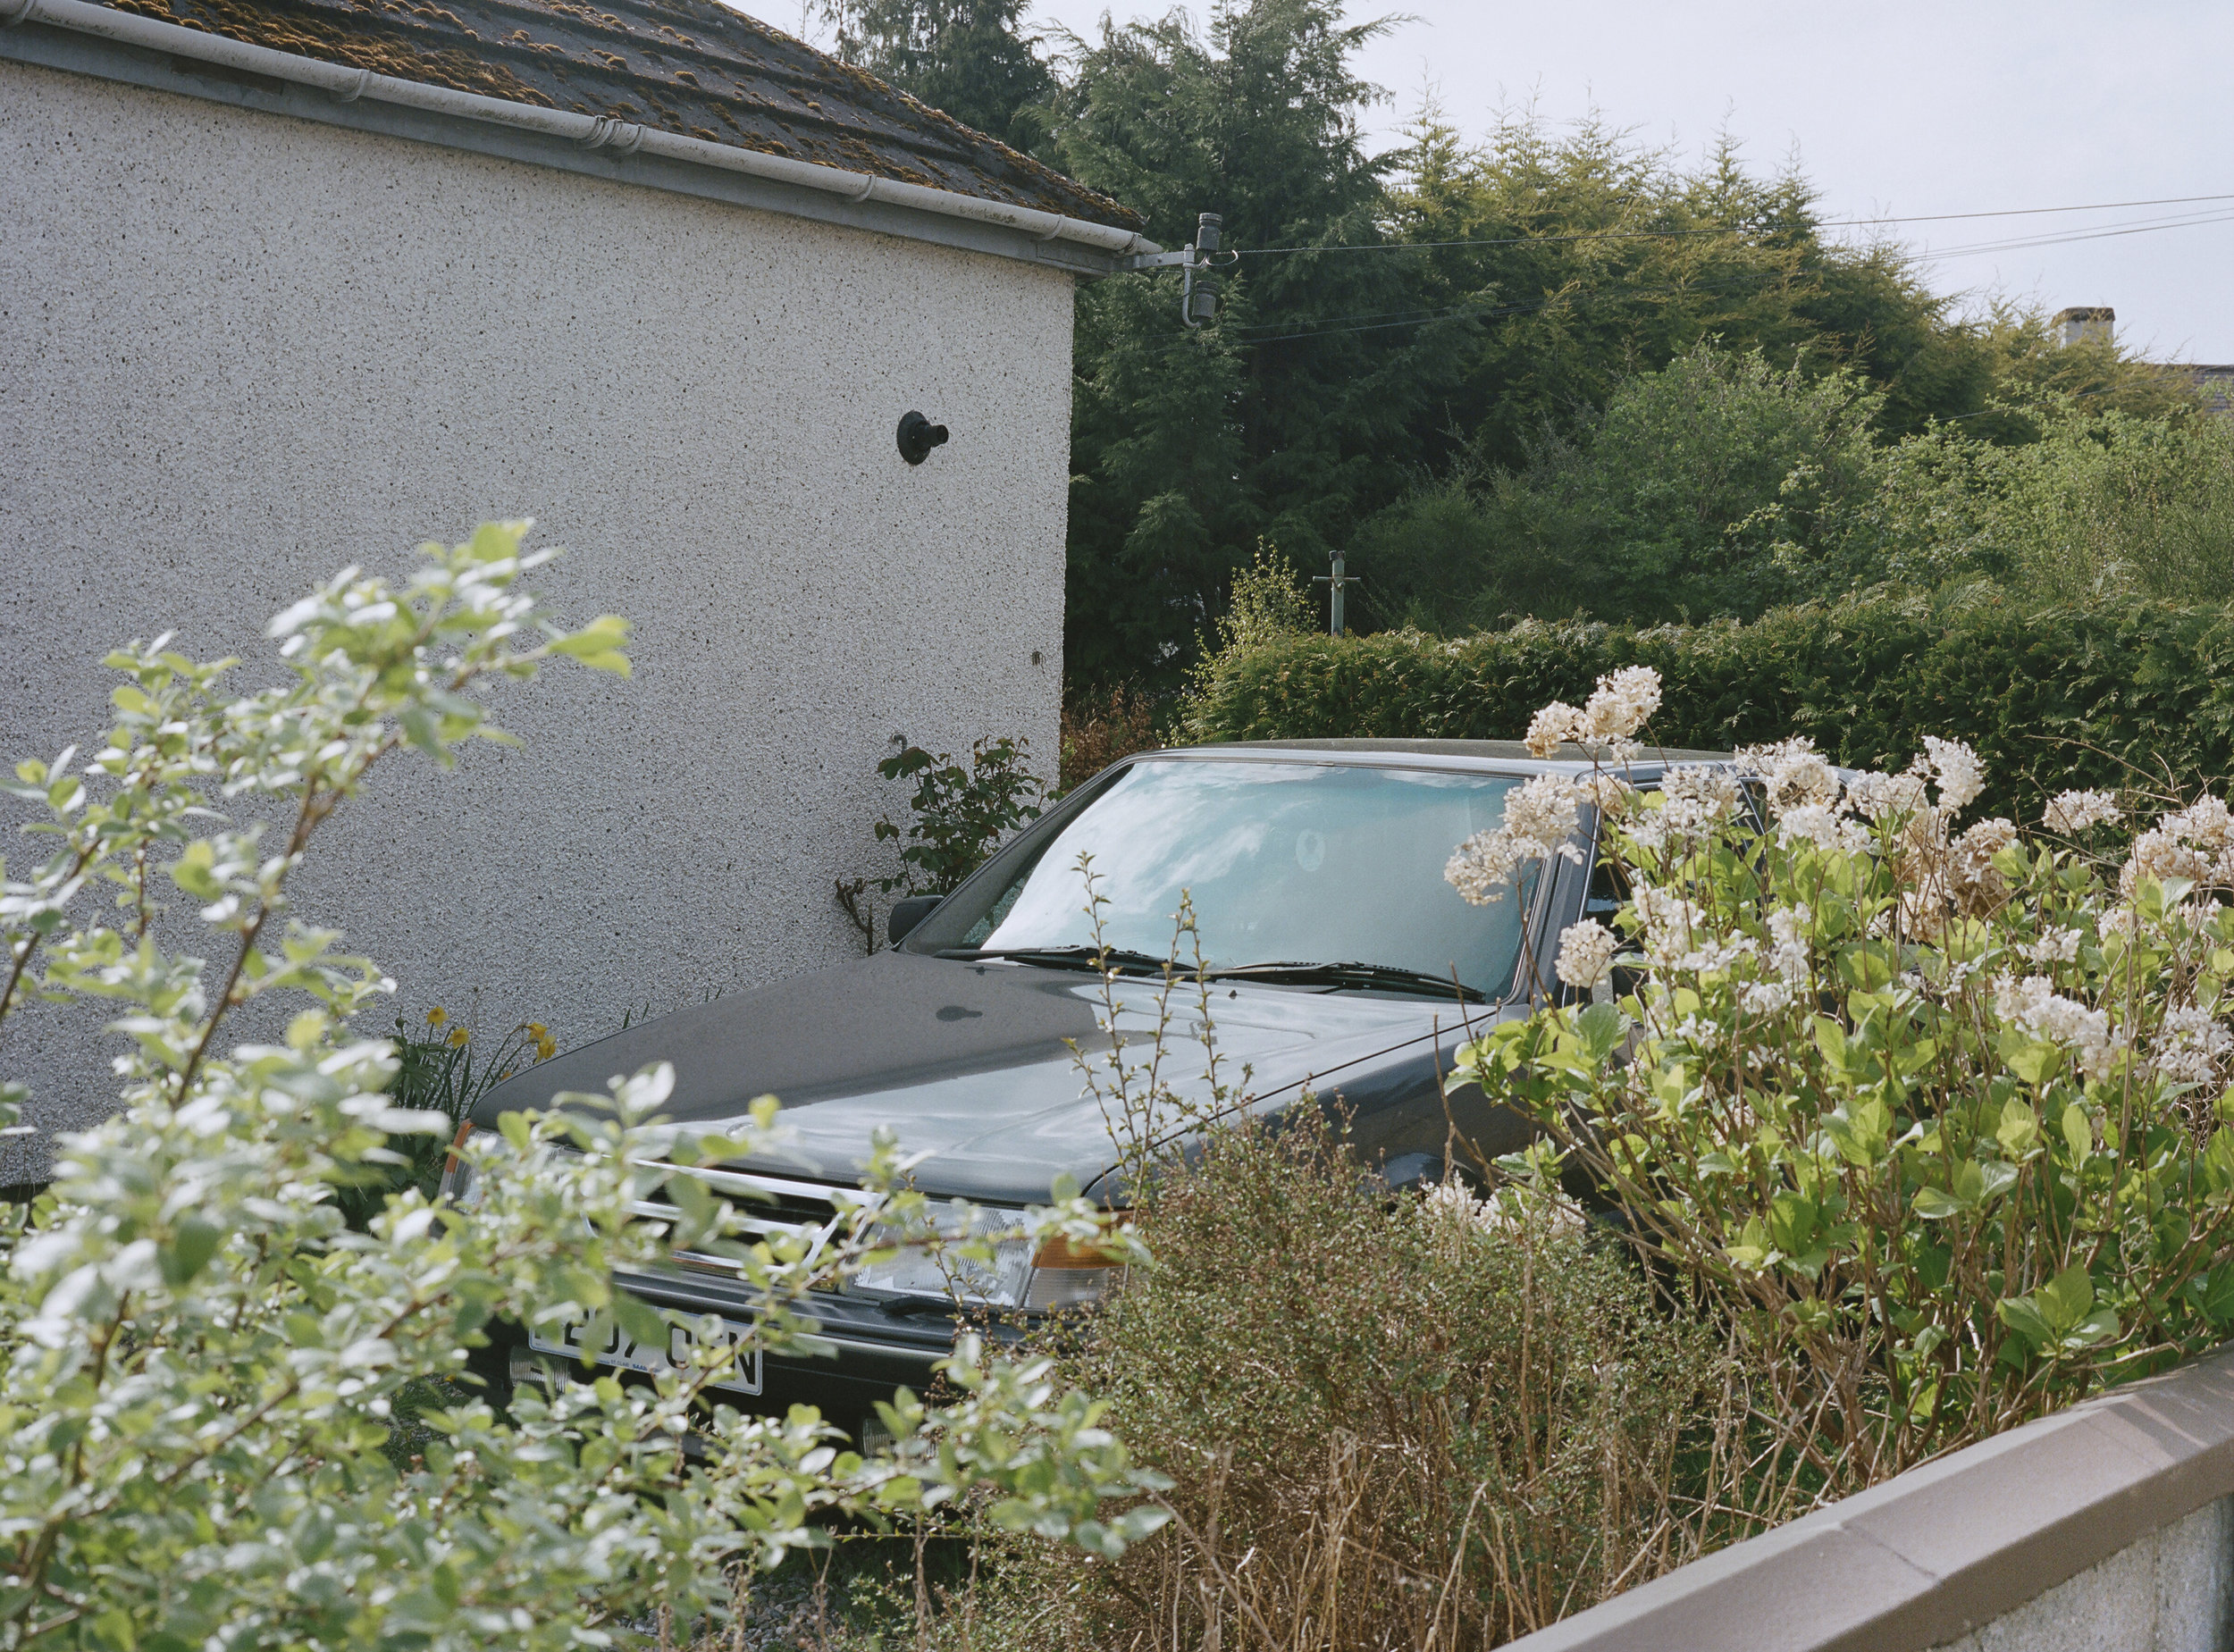 parked car/scotland